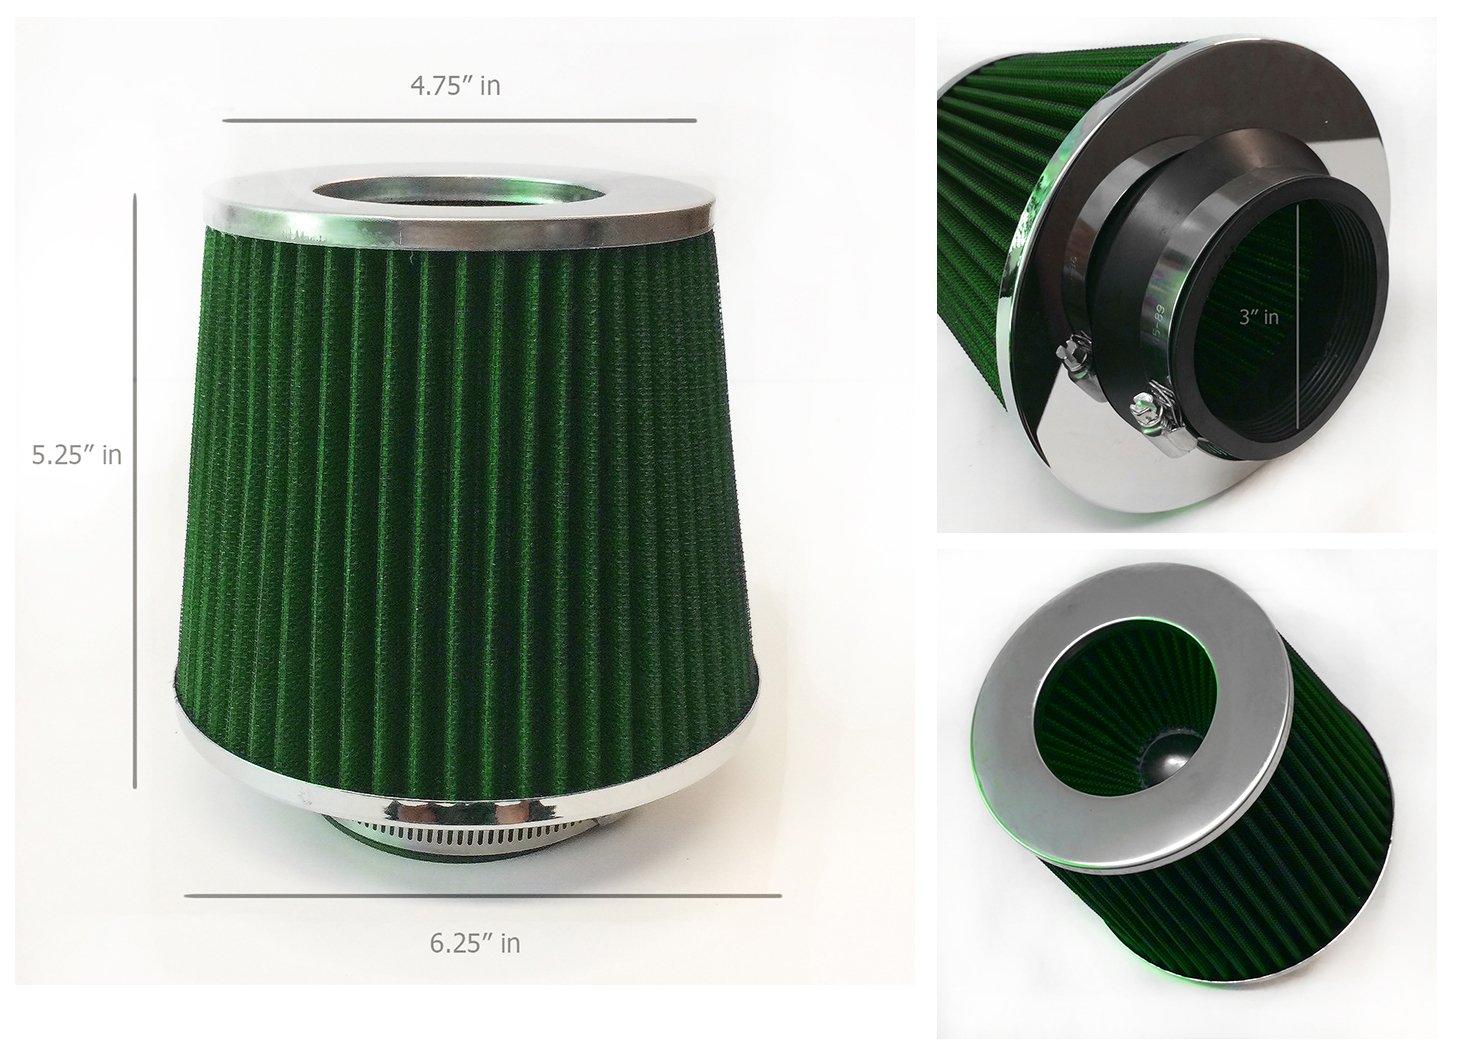 3'' Inlet (76mm) Cold Air Intake Short Ram Intake Chrome Open Top Air Filter Universal (Green)